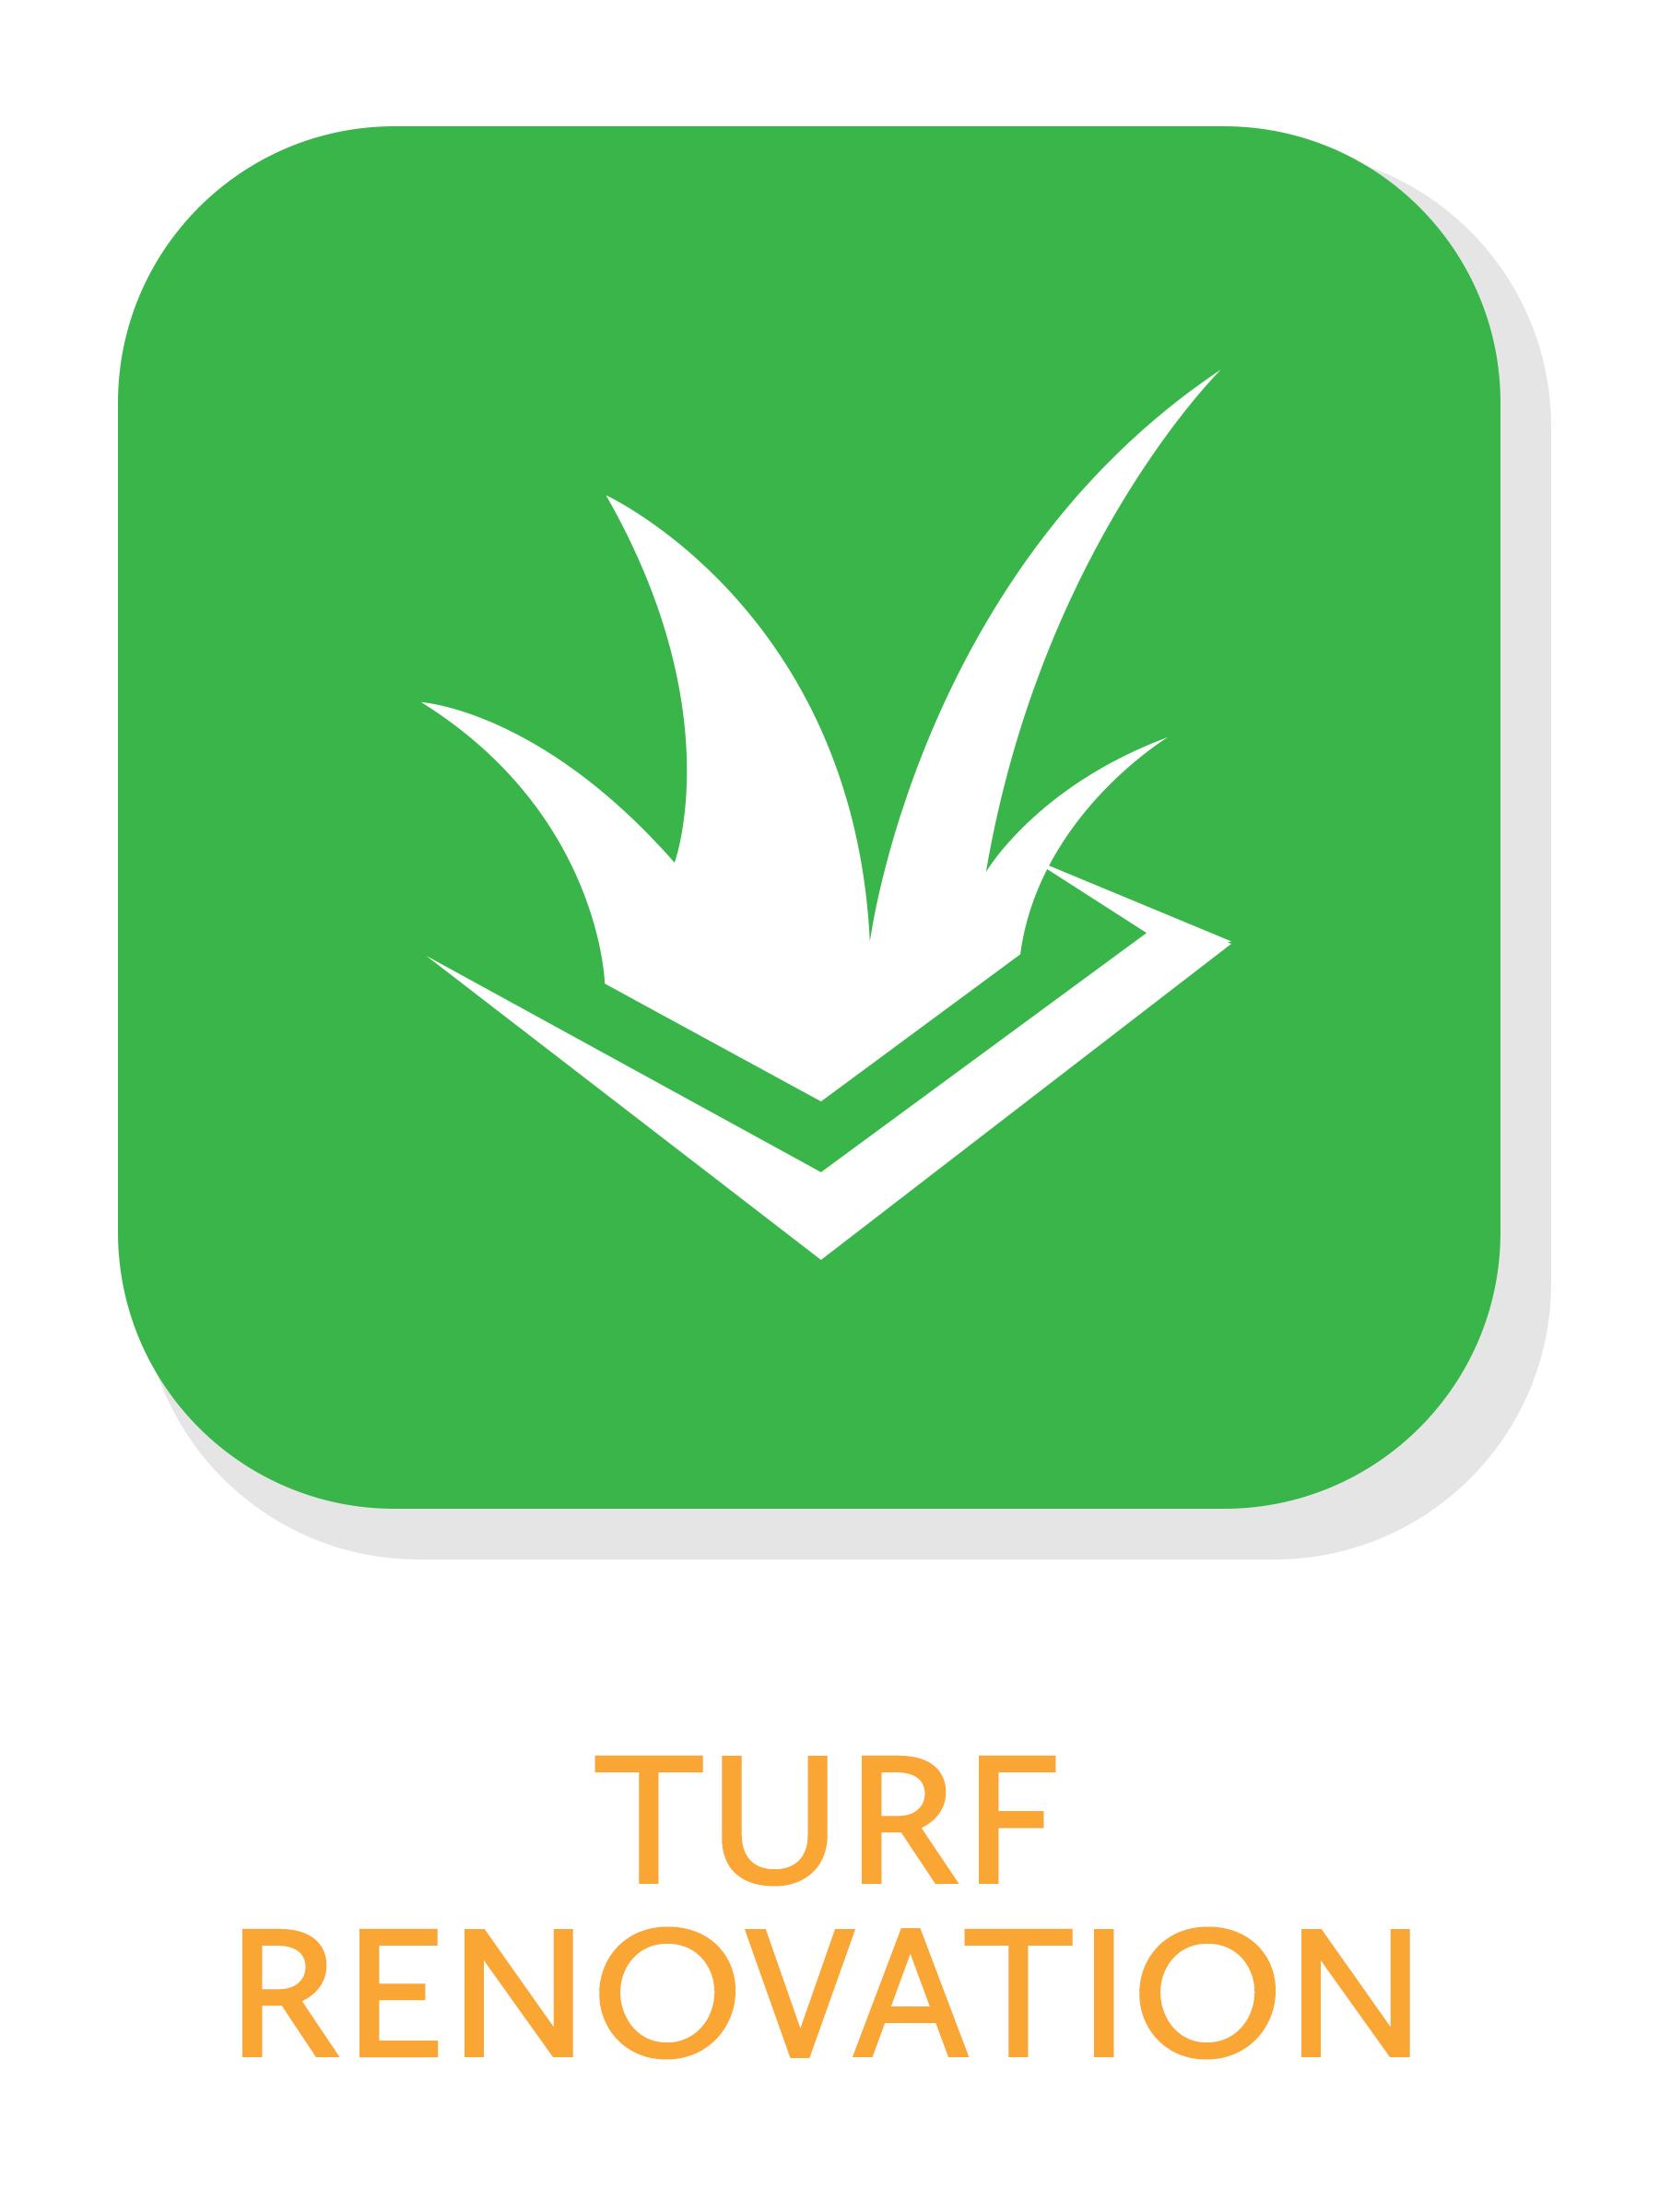 Simply Grass Icon (Turf Renovation).jpg